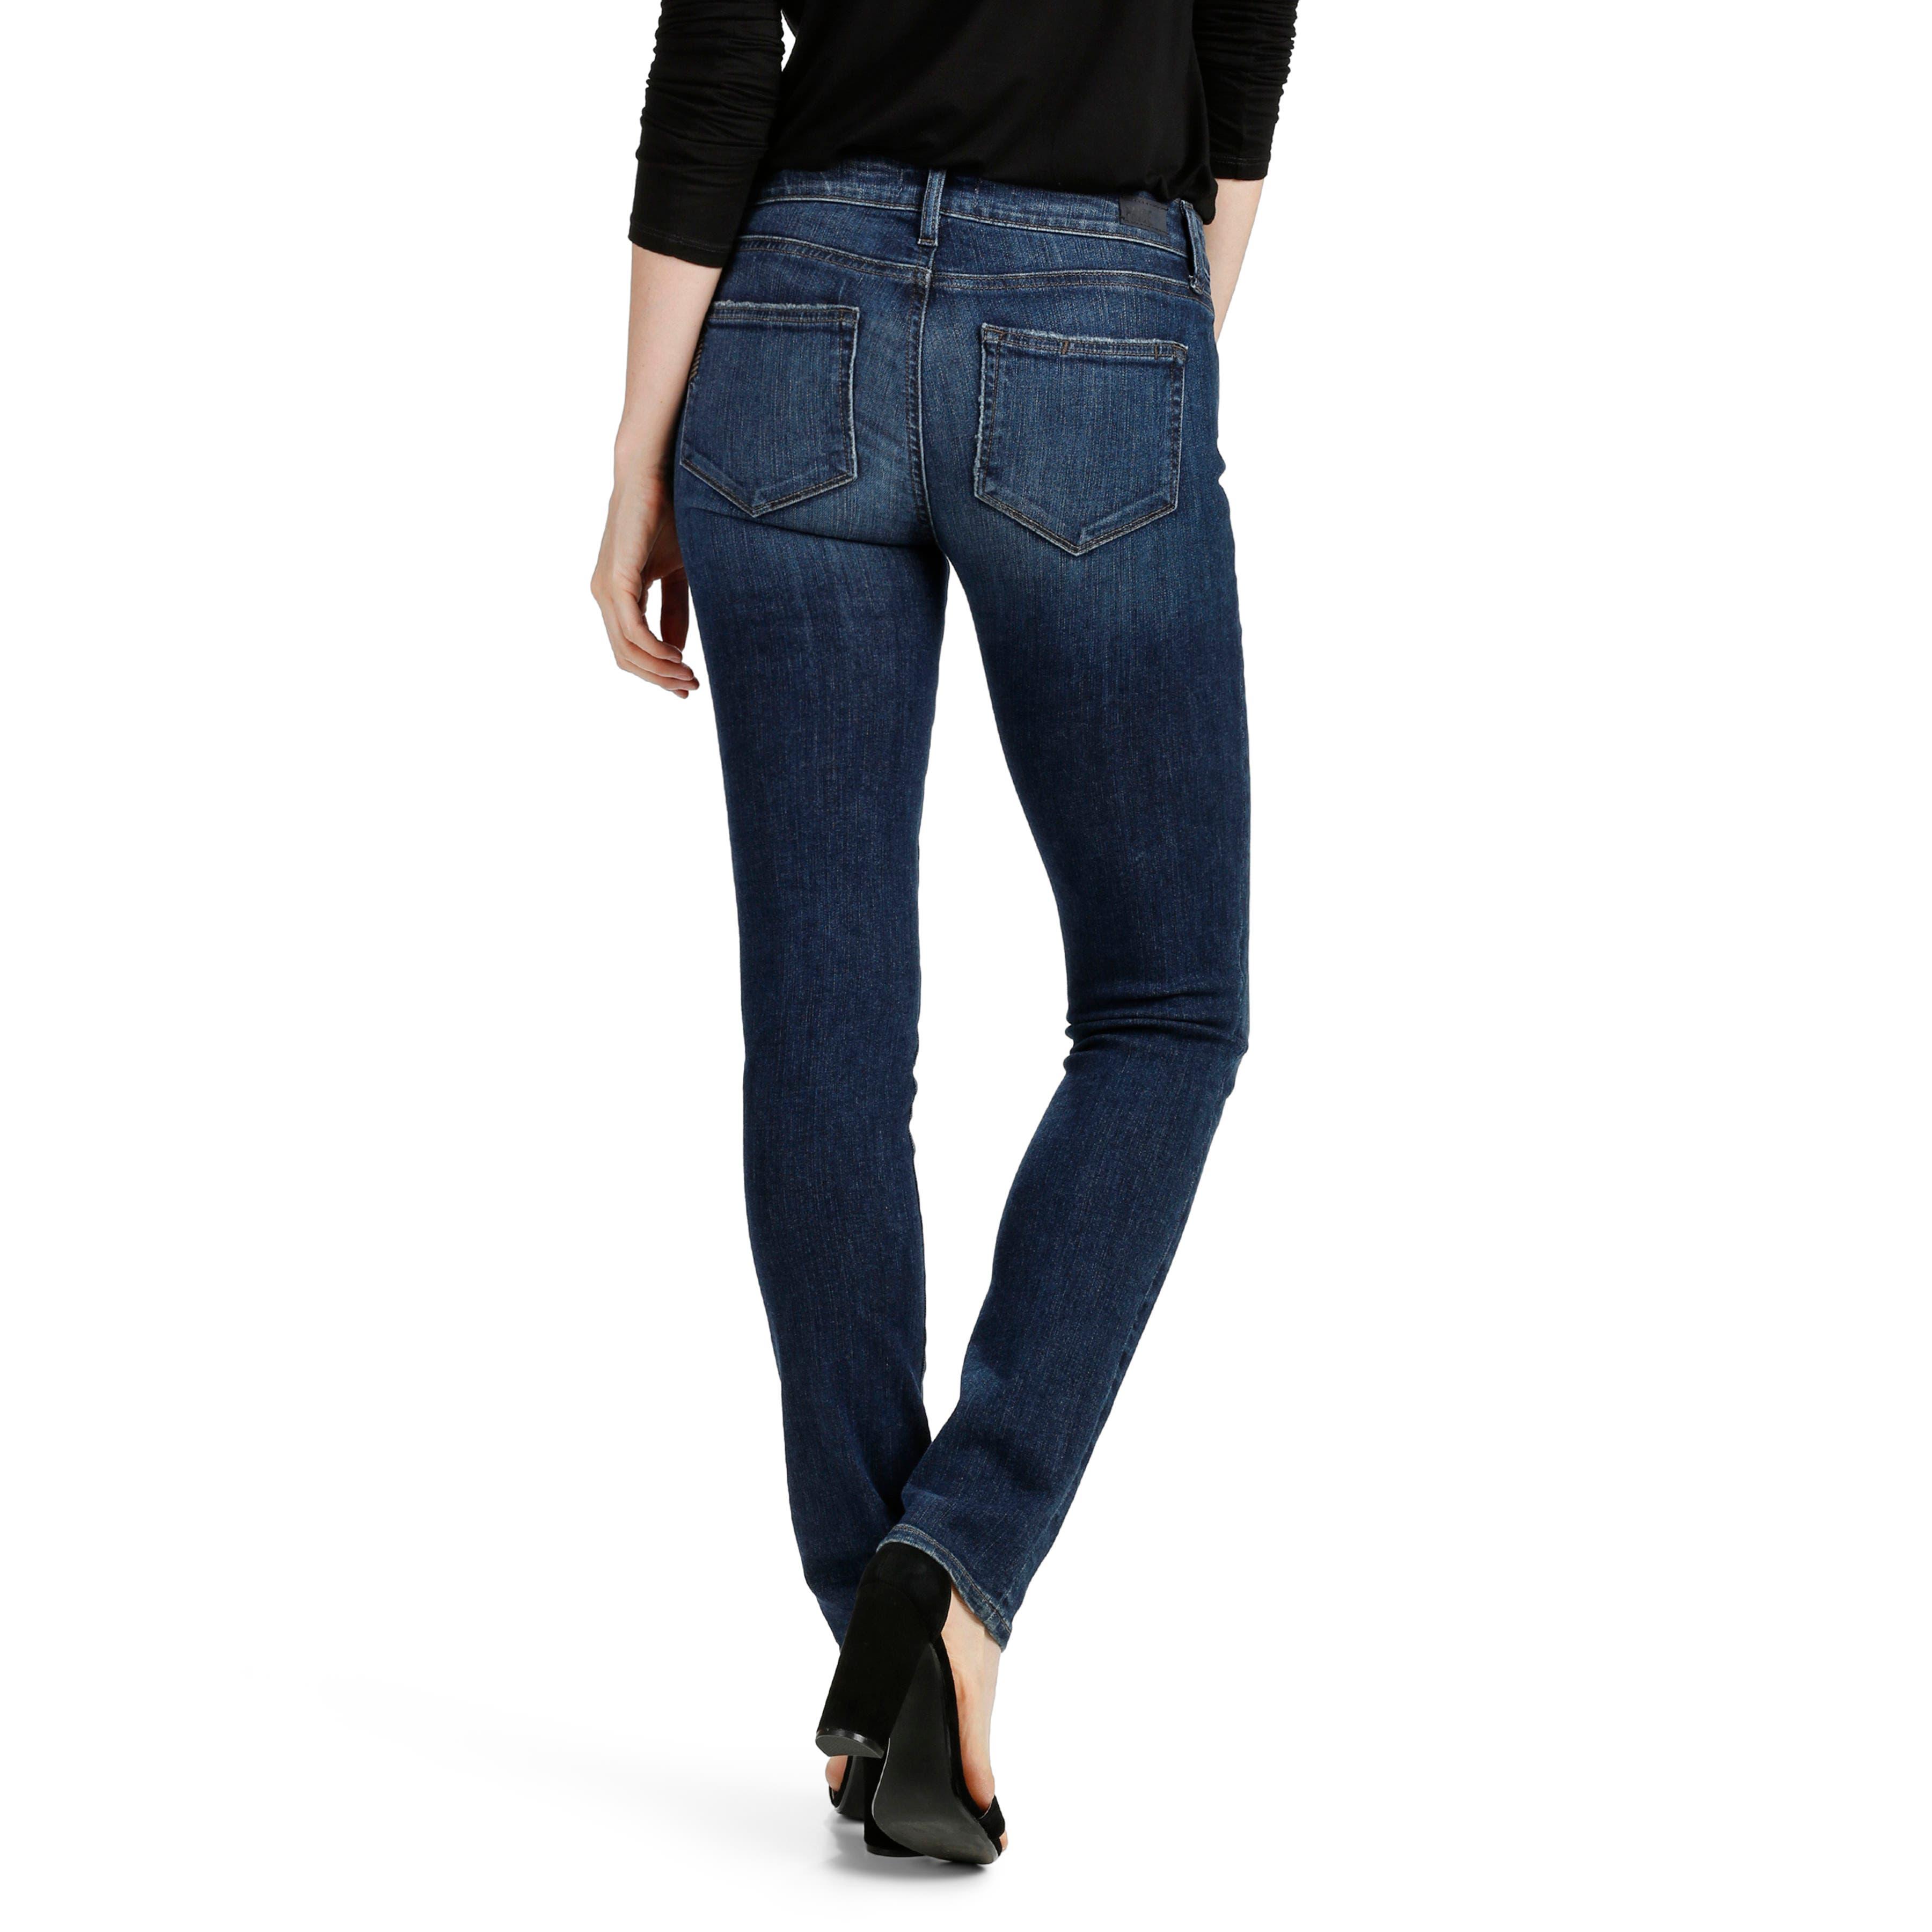 Transcend - Skyline Skinny Jeans,                             Alternate thumbnail 2, color,                             Percy